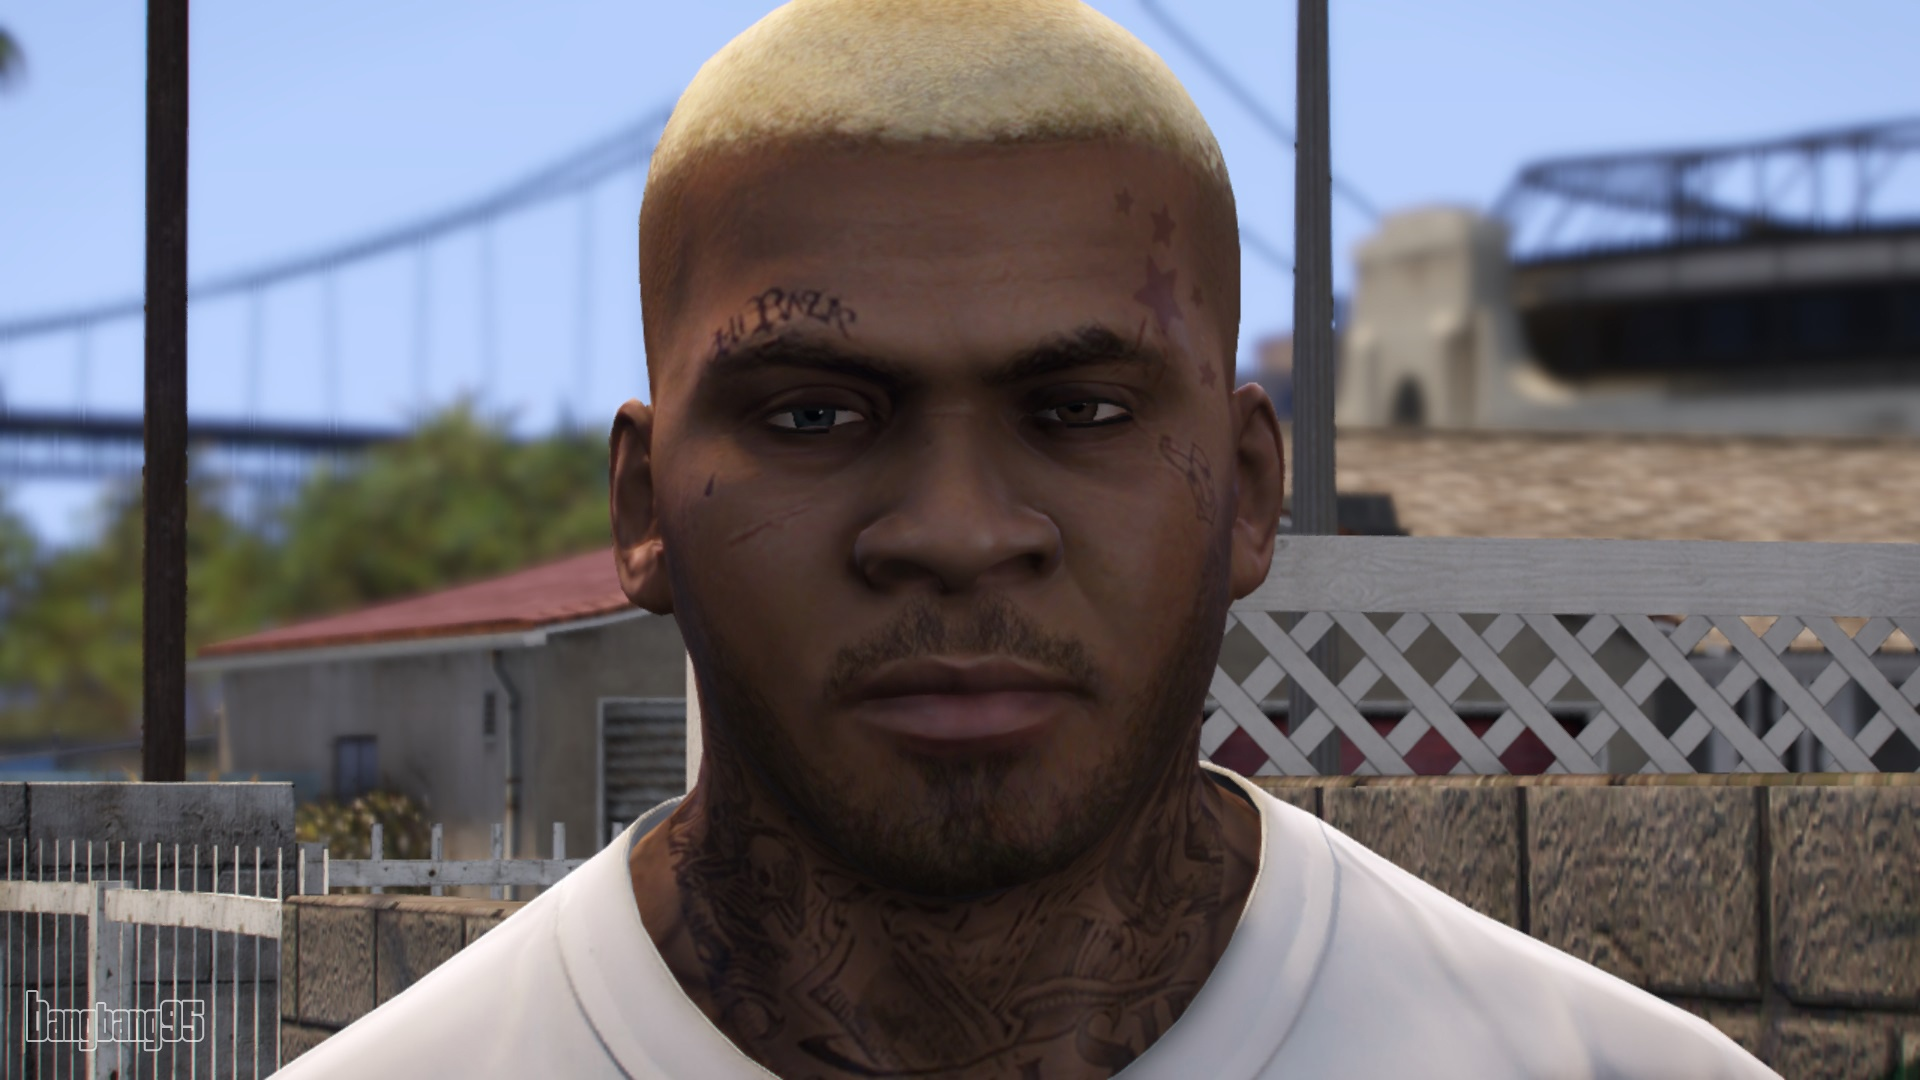 New Improved Face - Franklin 3.0